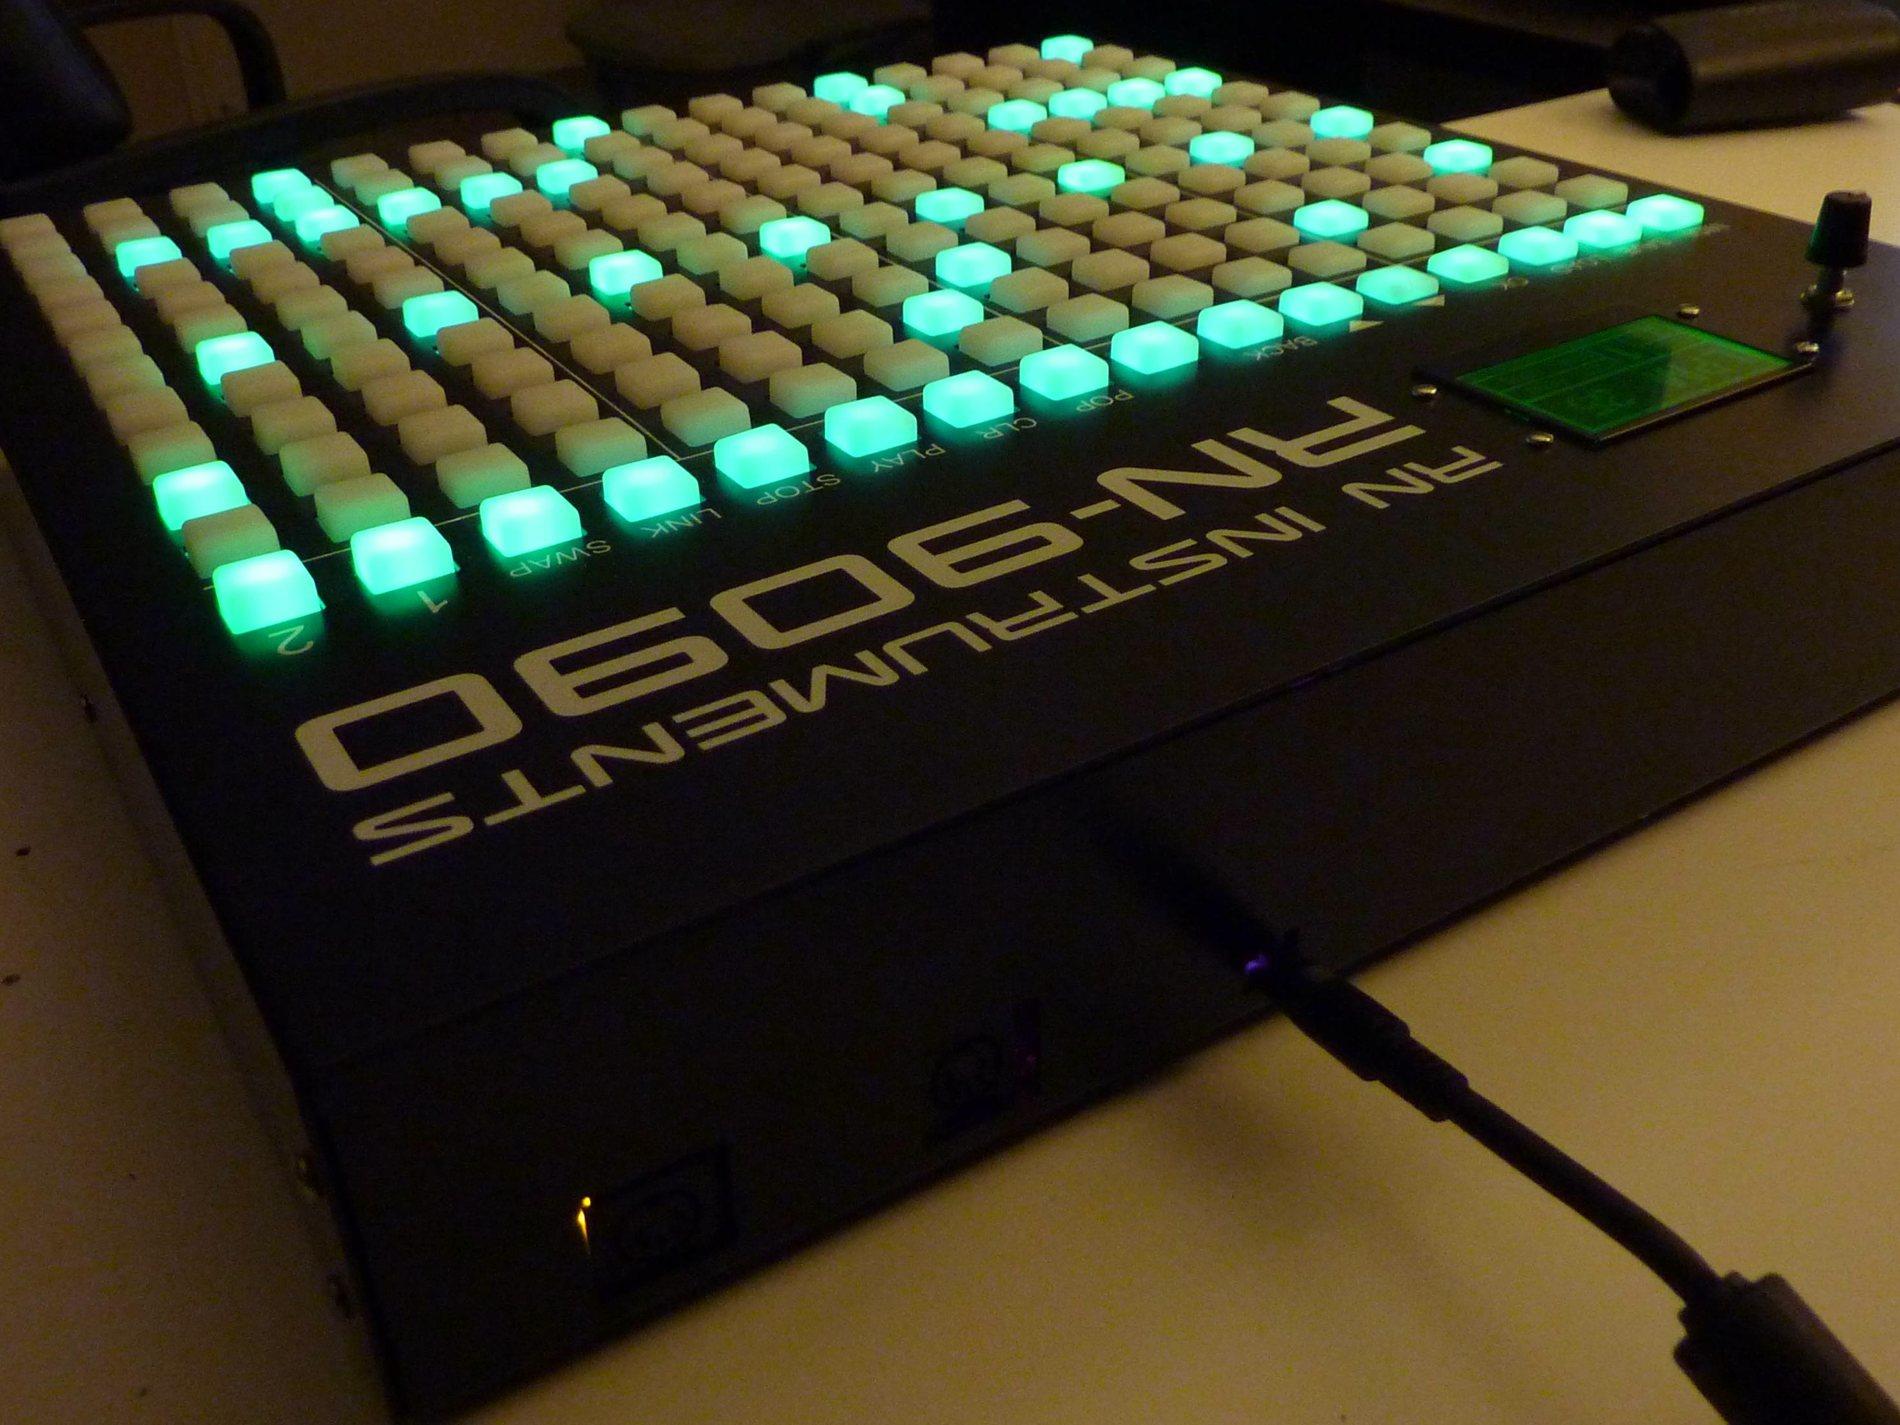 Build a polyrhythmic sequencer with Raspberry Pi - The